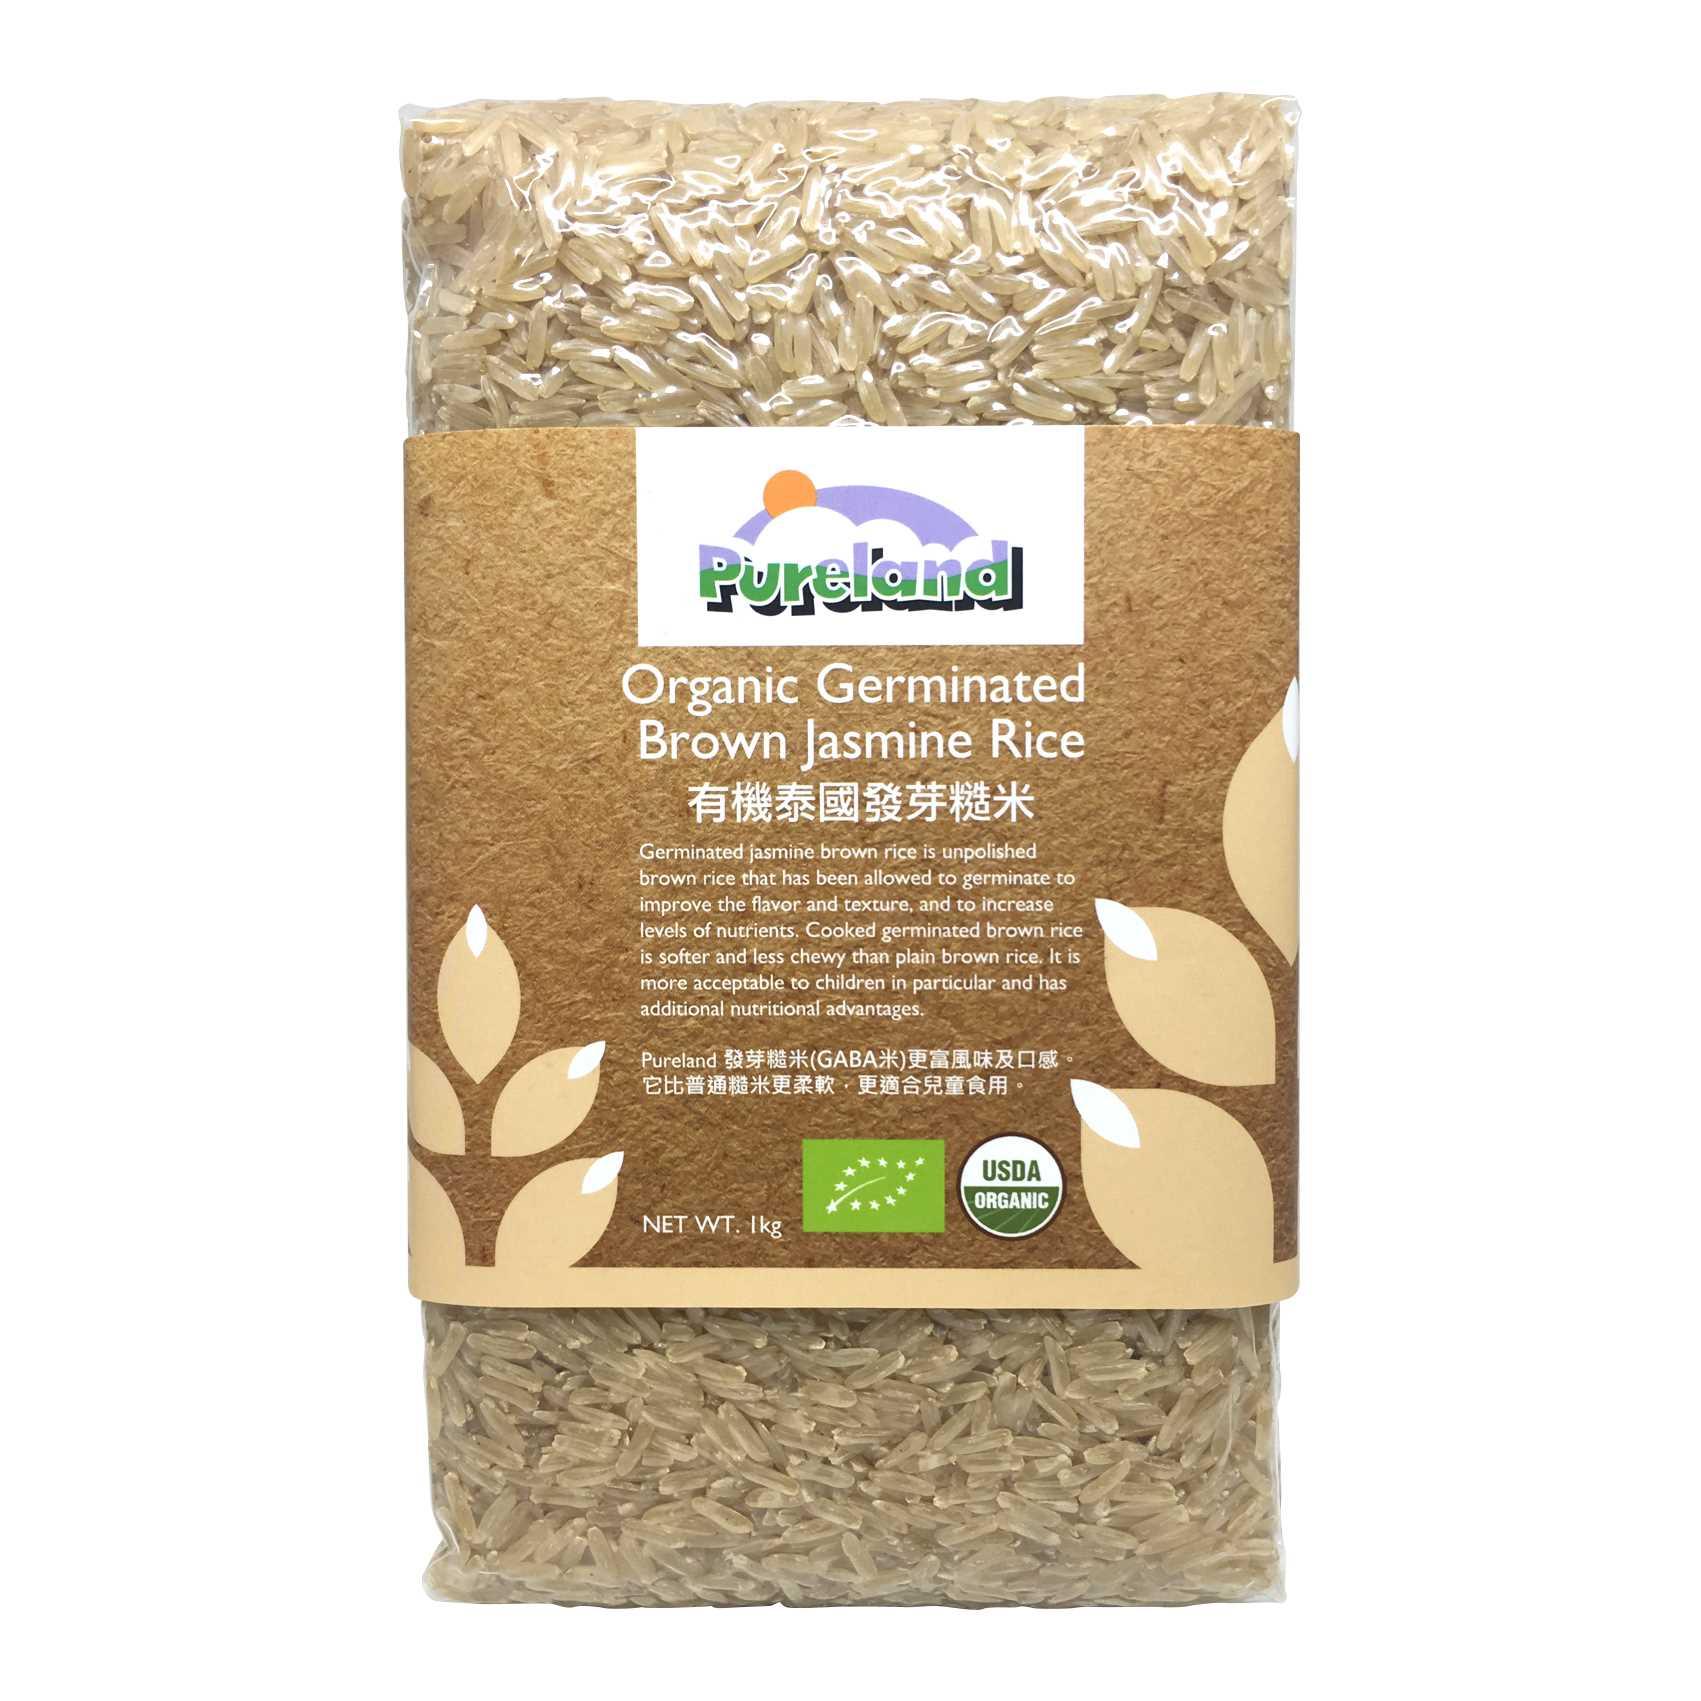 Pureland 有机泰国发芽糙米 1kg